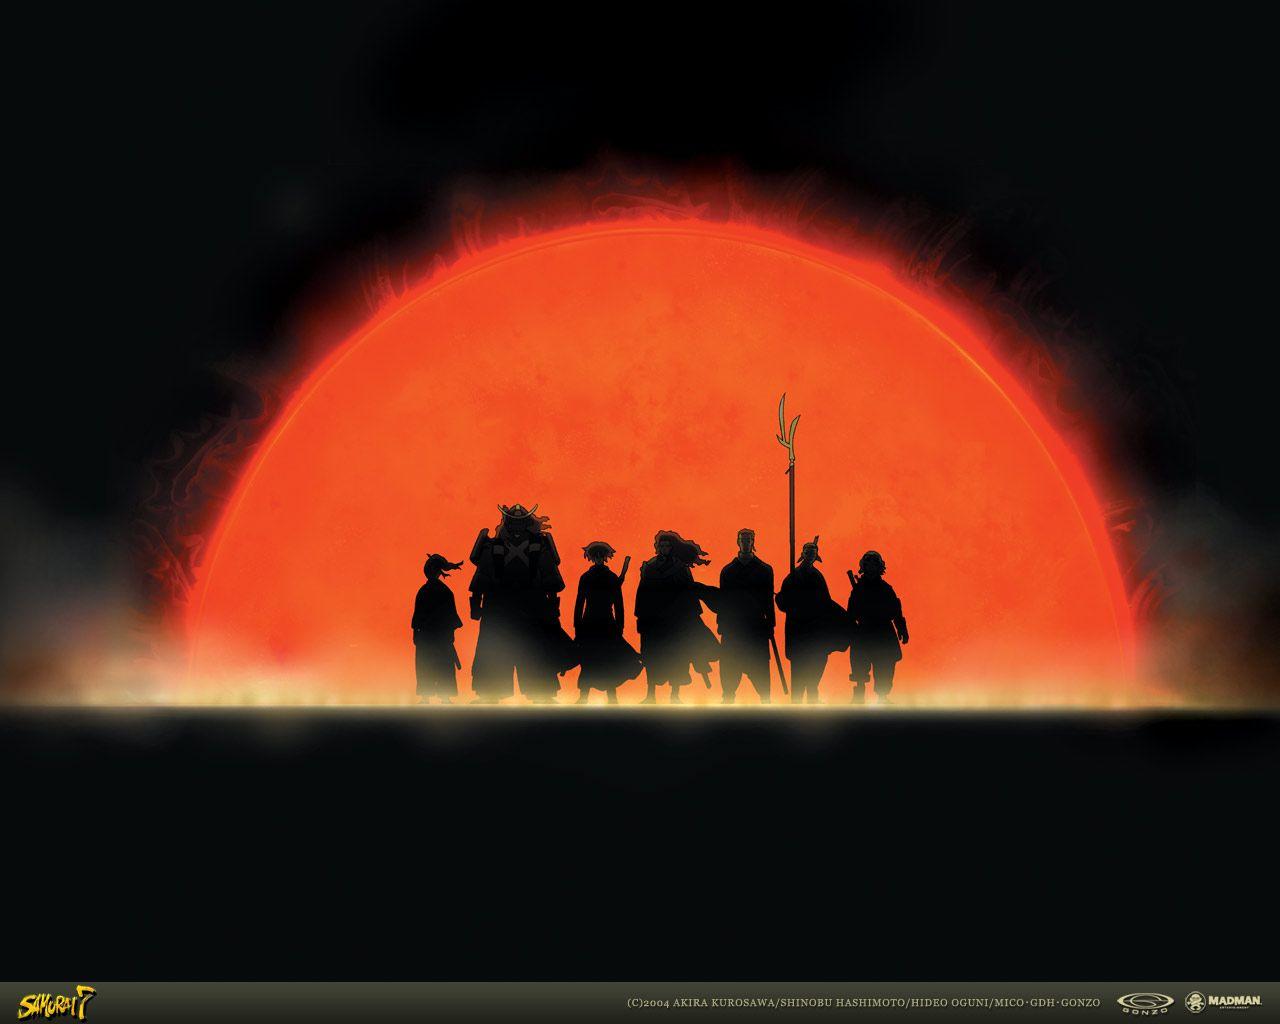 Silent Divergence Anime Group Samurai 7 Samurai Ninja Art